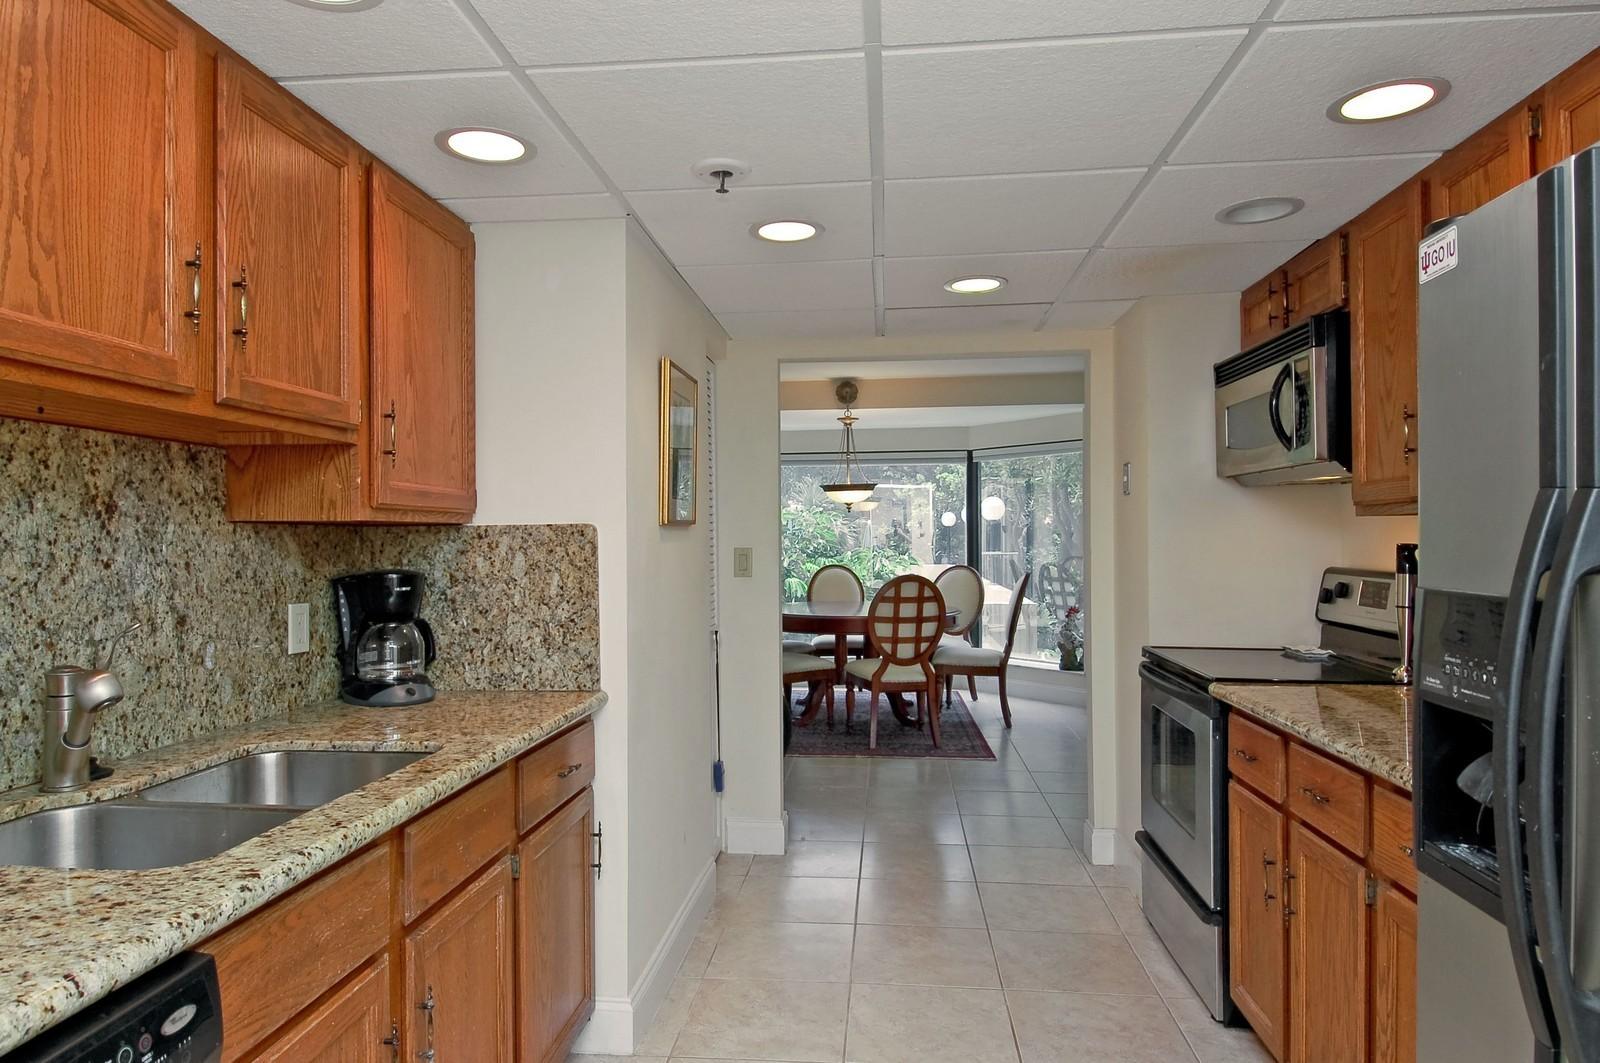 Real Estate Photography - 4605 S Ocean Blvd, Unit 3B, Highland Beach, FL, 33487 - Kitchen